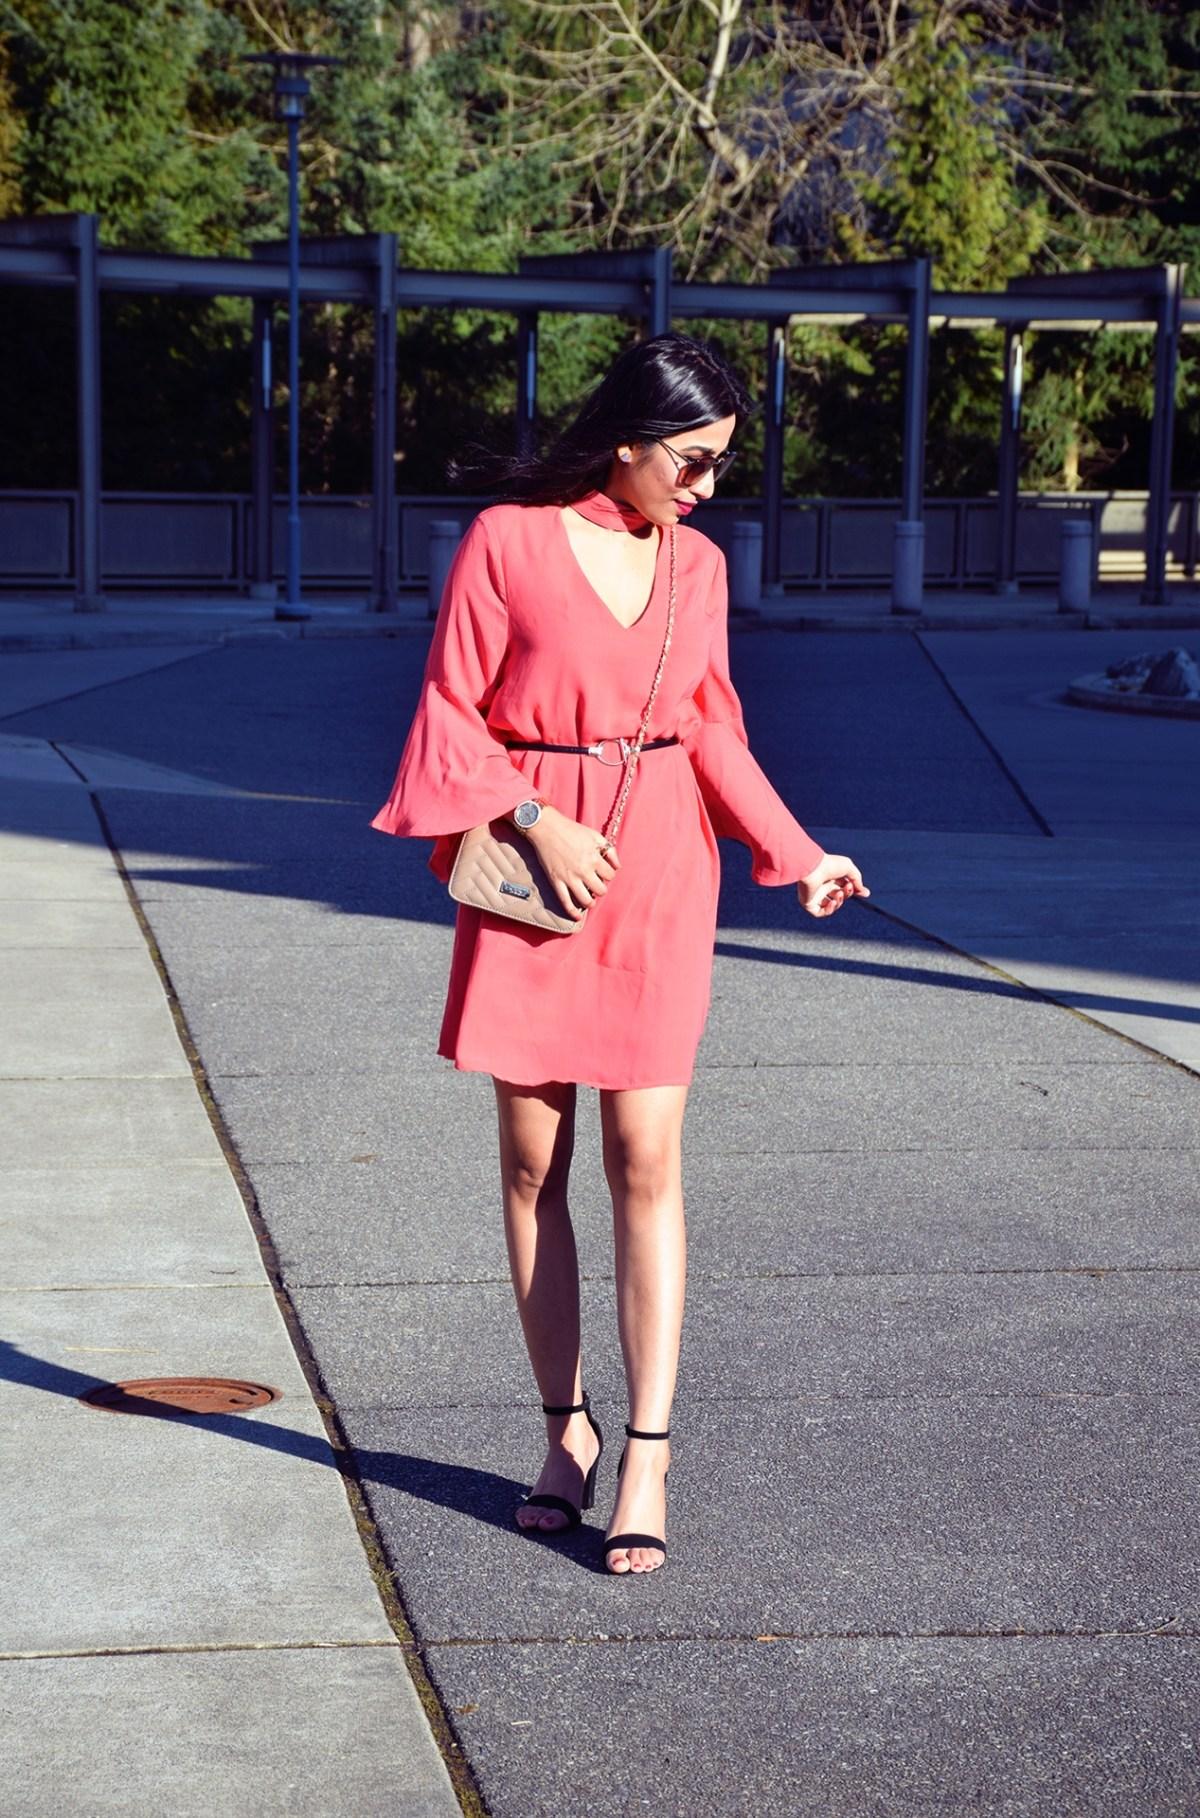 https://www.pinkblushmaternity.com/p-47024-coral-solid-mock-neck-ruffle-sleeve-dress.aspx?DepartmentID=2